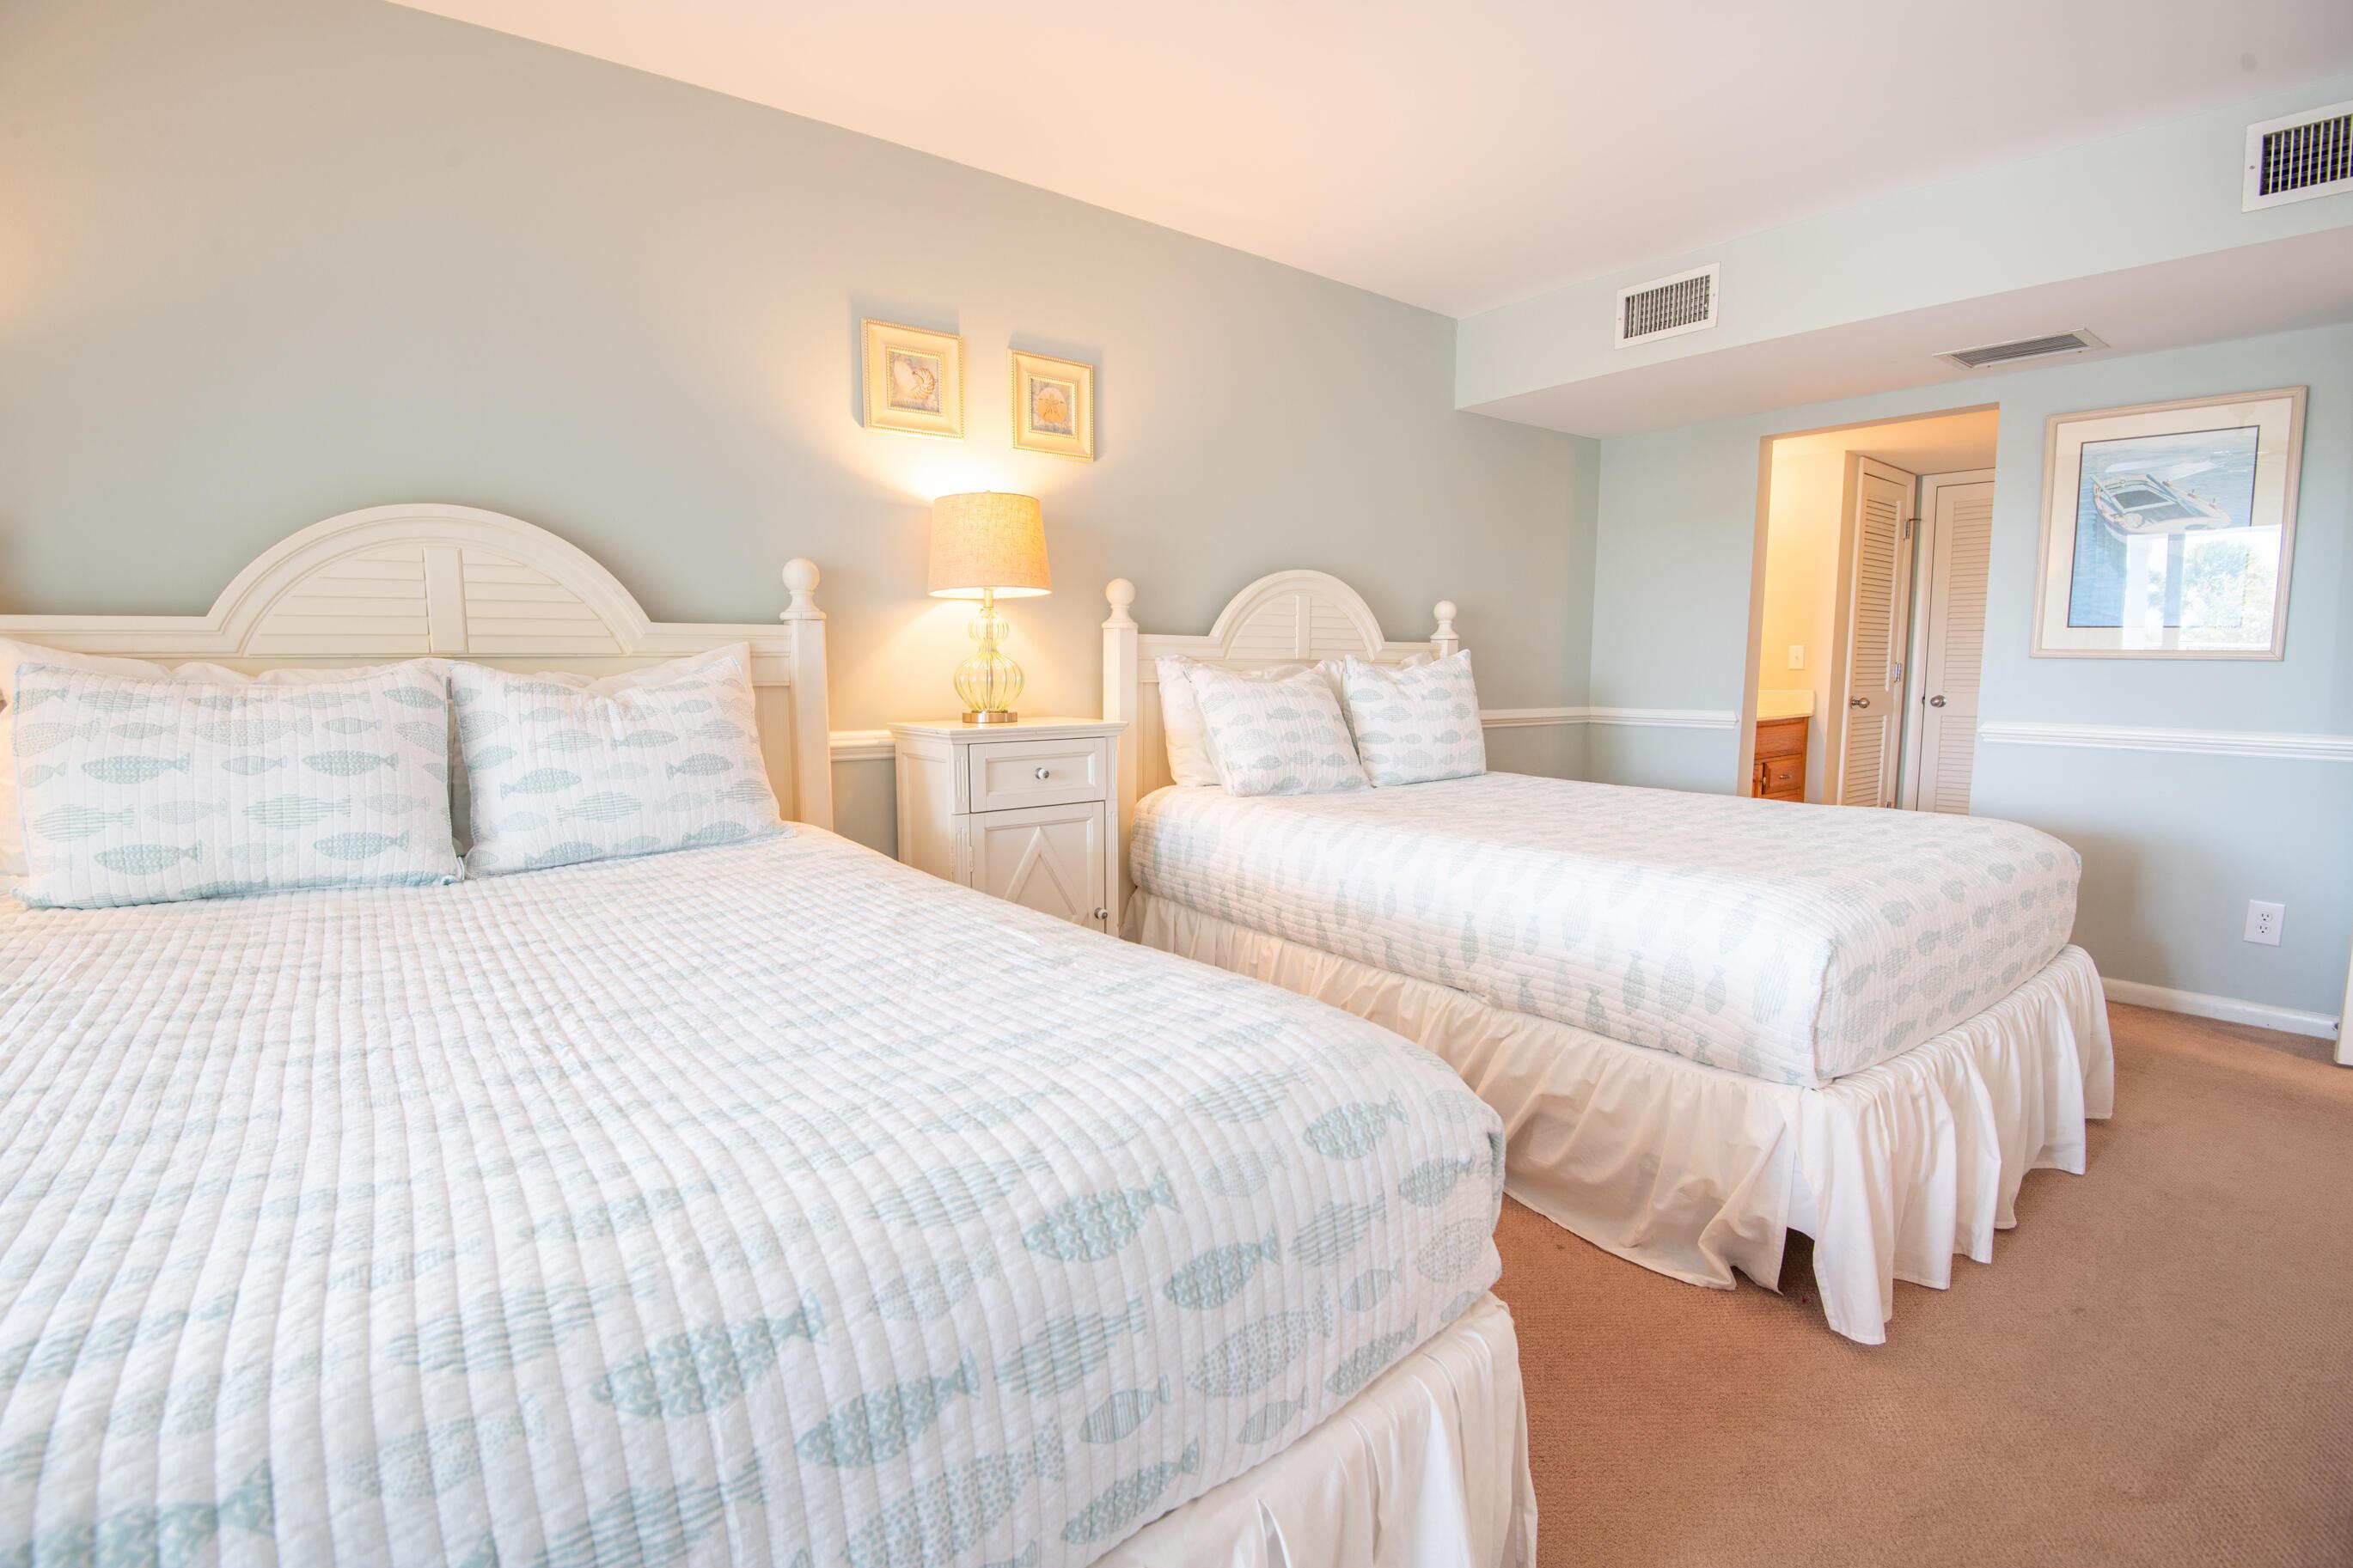 Atrium Villas Homes For Sale - 2935 Atrium Villa, Seabrook Island, SC - 23